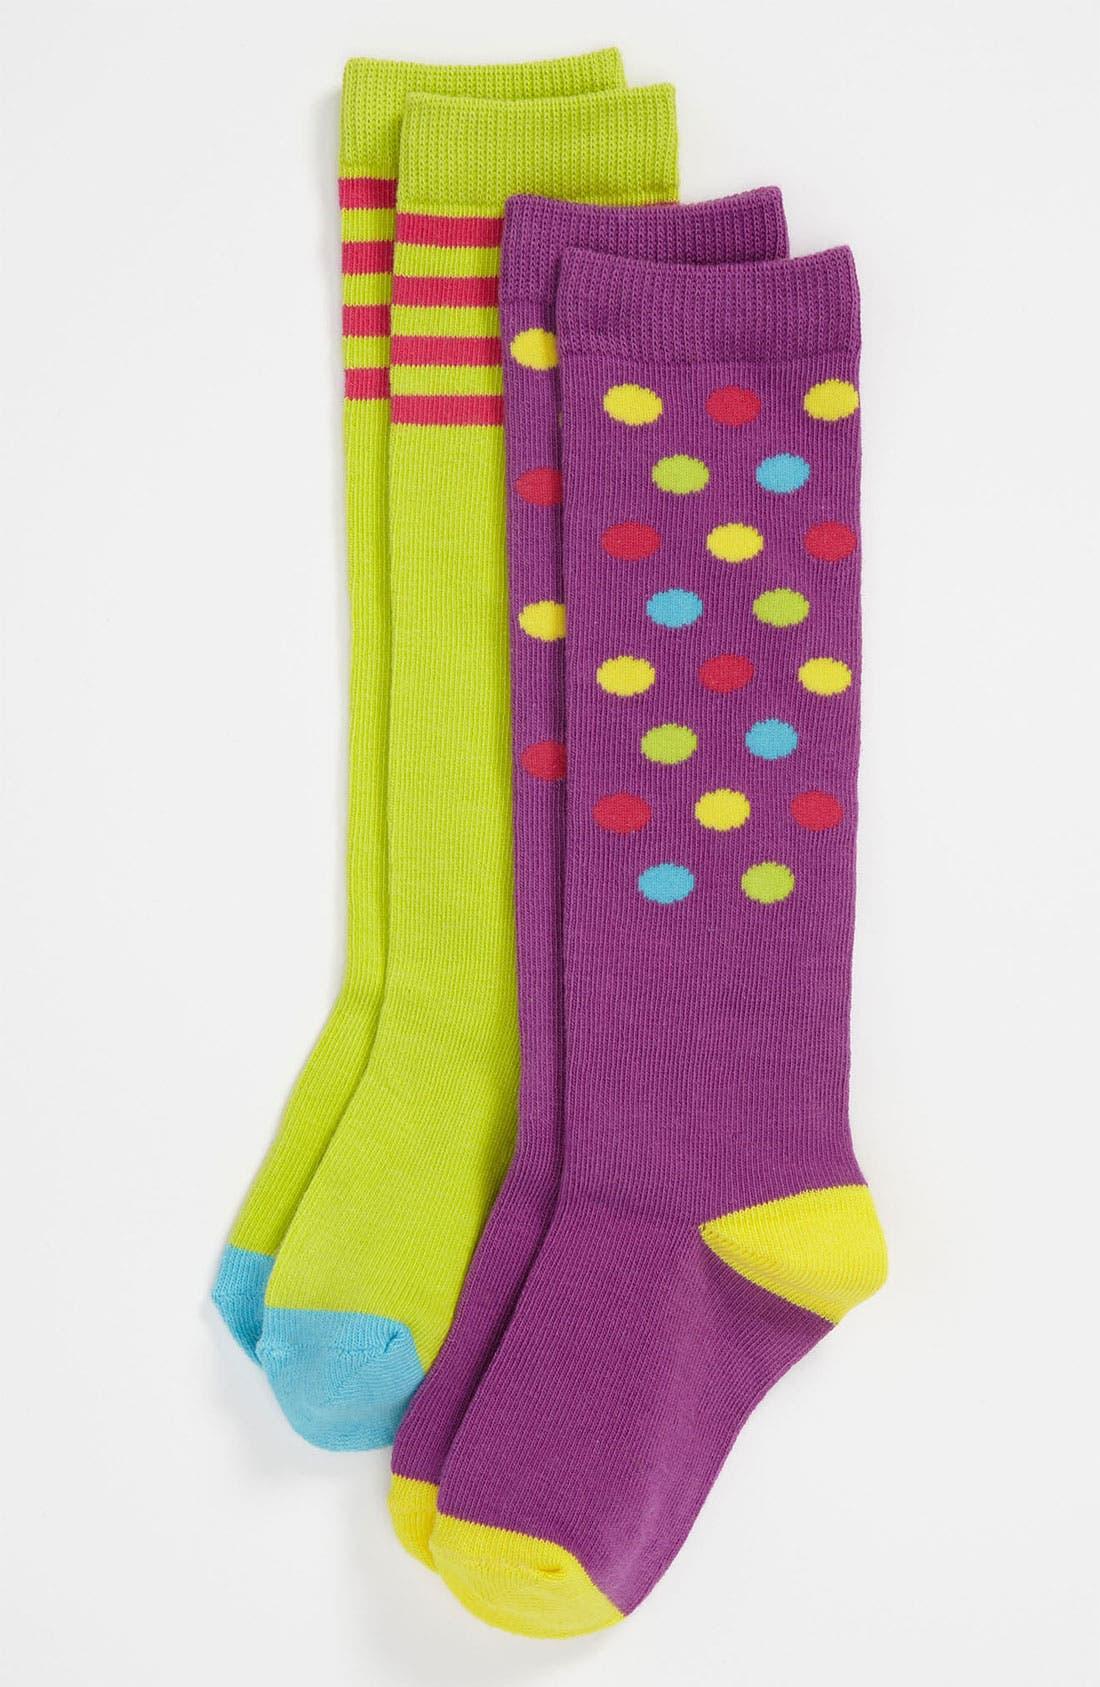 Alternate Image 1 Selected - Nordstrom 'Mix & Match' Knee Socks (2-Pack) (Girls)